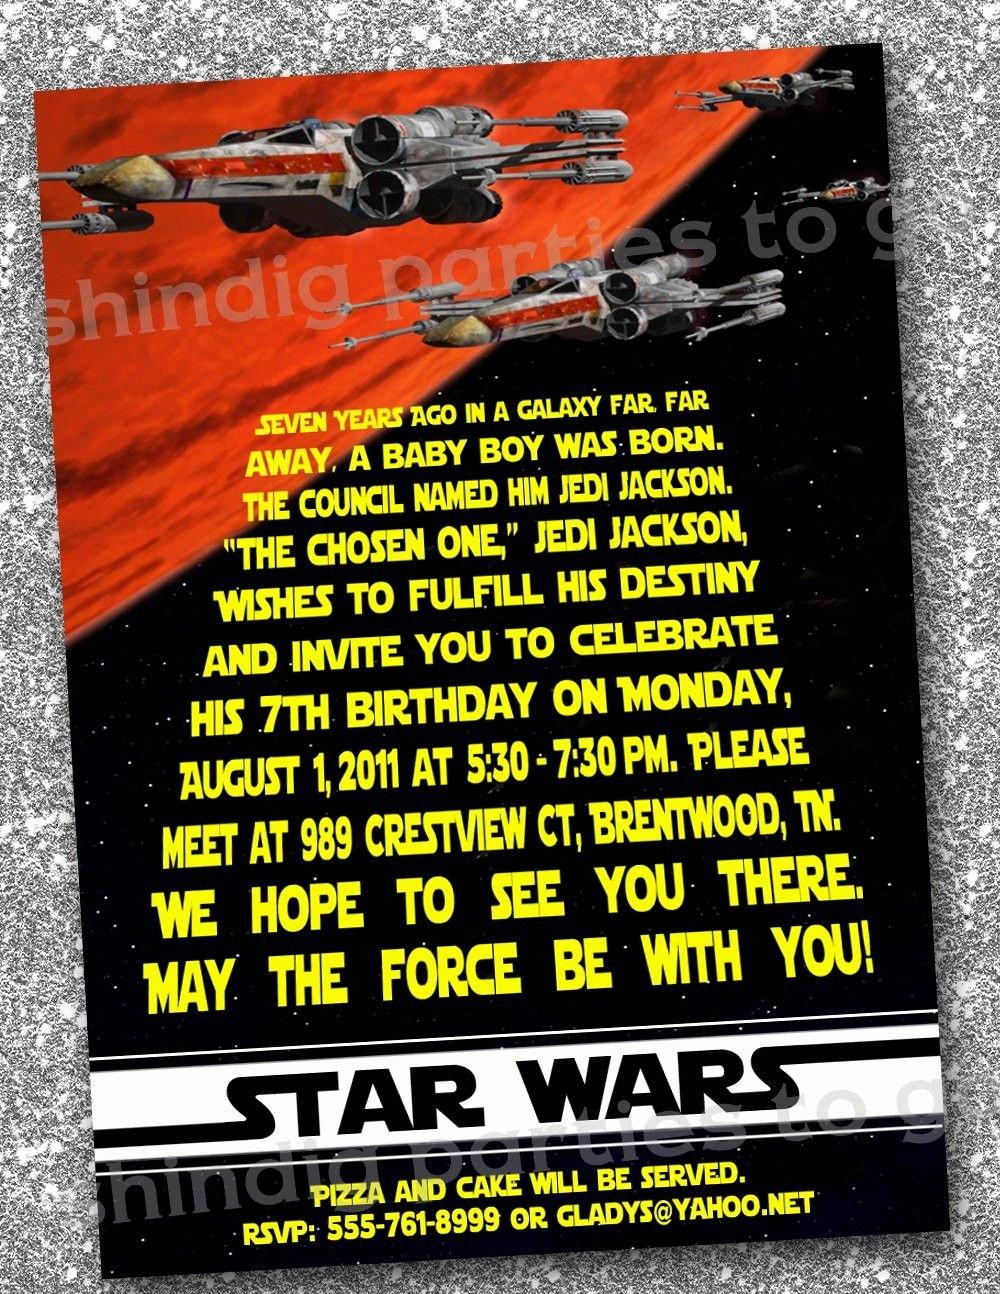 Printable Star Wars Birthday Invitations Beautiful Star Wars Birthday Invitations Templates Free Star Wars Bday